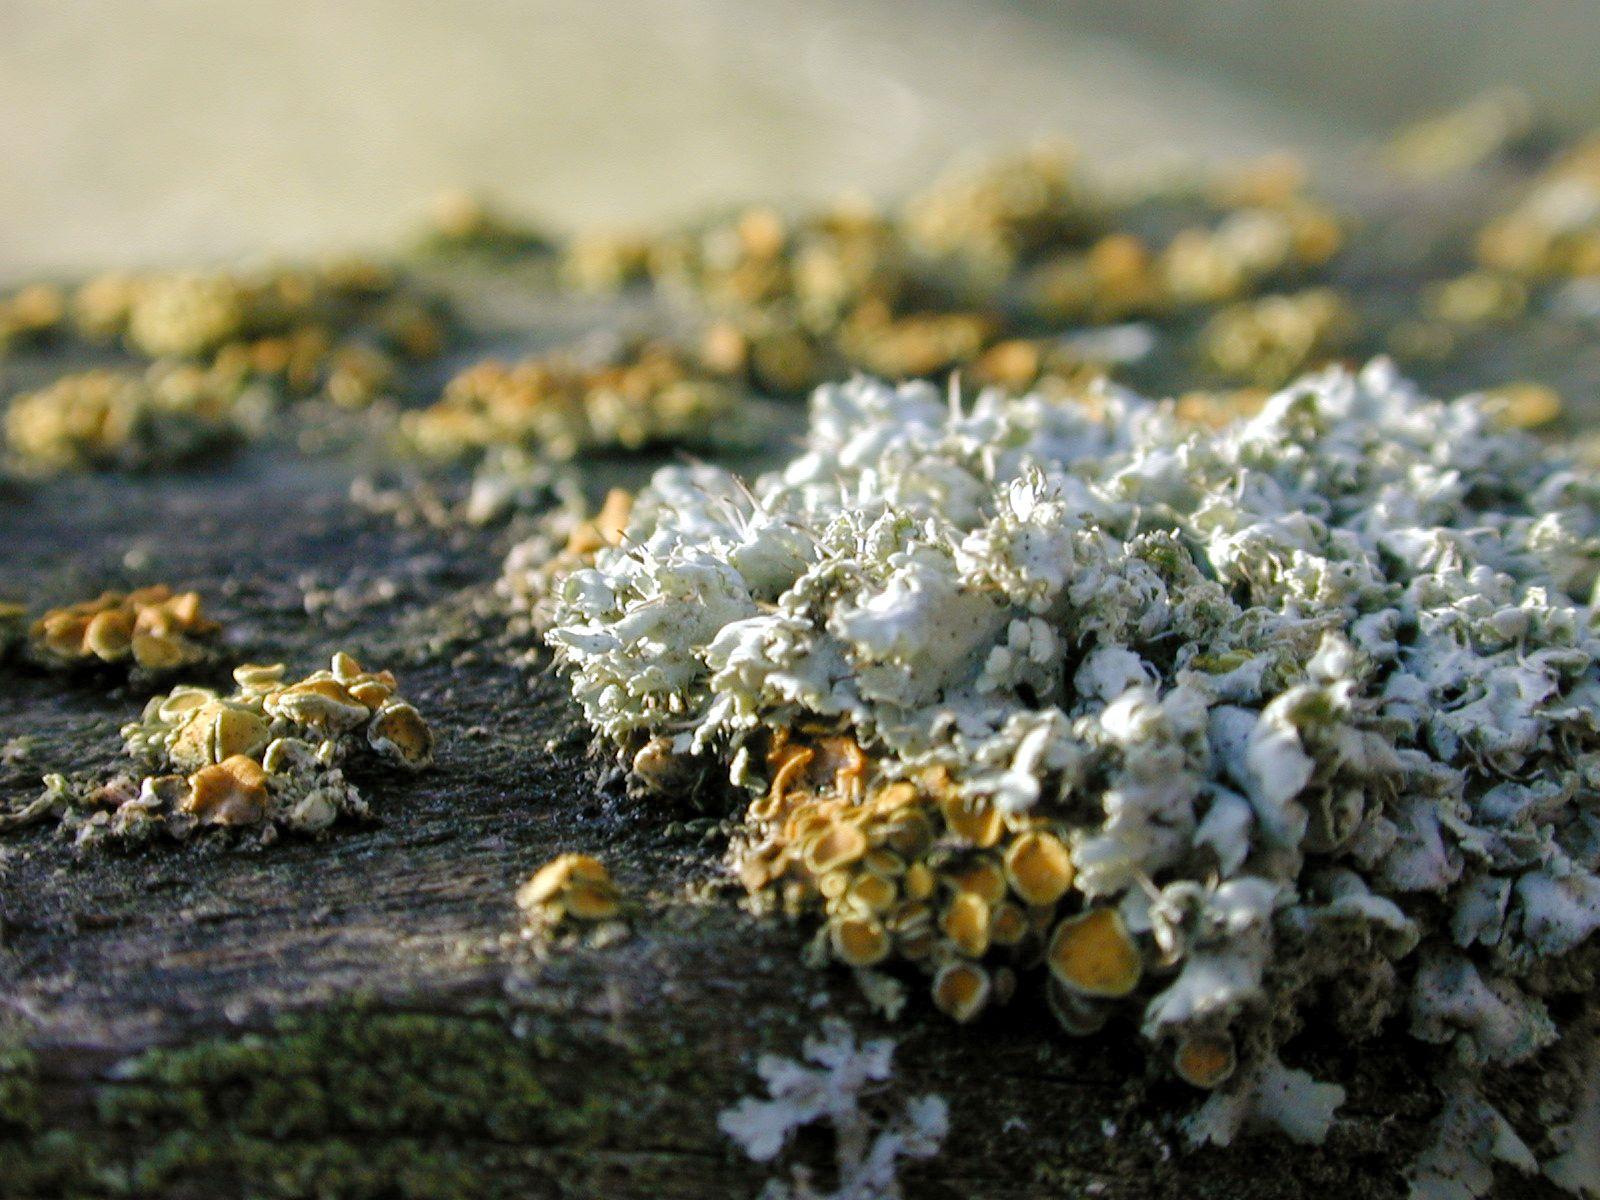 moss mosses ground growing fungus fungi undergrowth bark wood